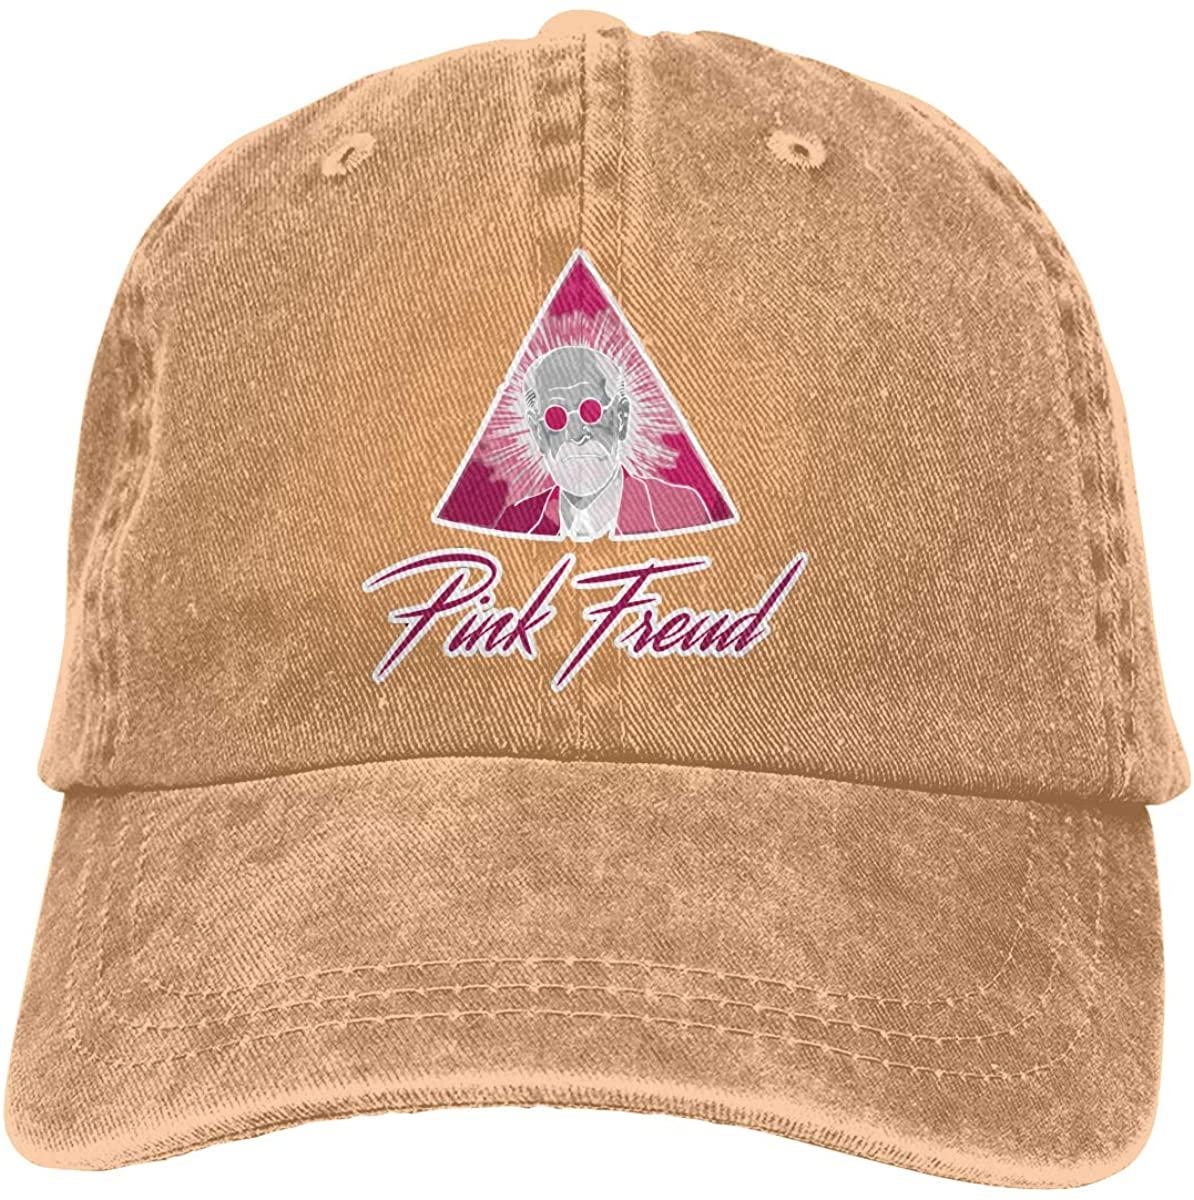 Nanobibi Pink Freud Baseball Caps Mens Womens Adult Adjustable Cowboy Hat Casquette Black